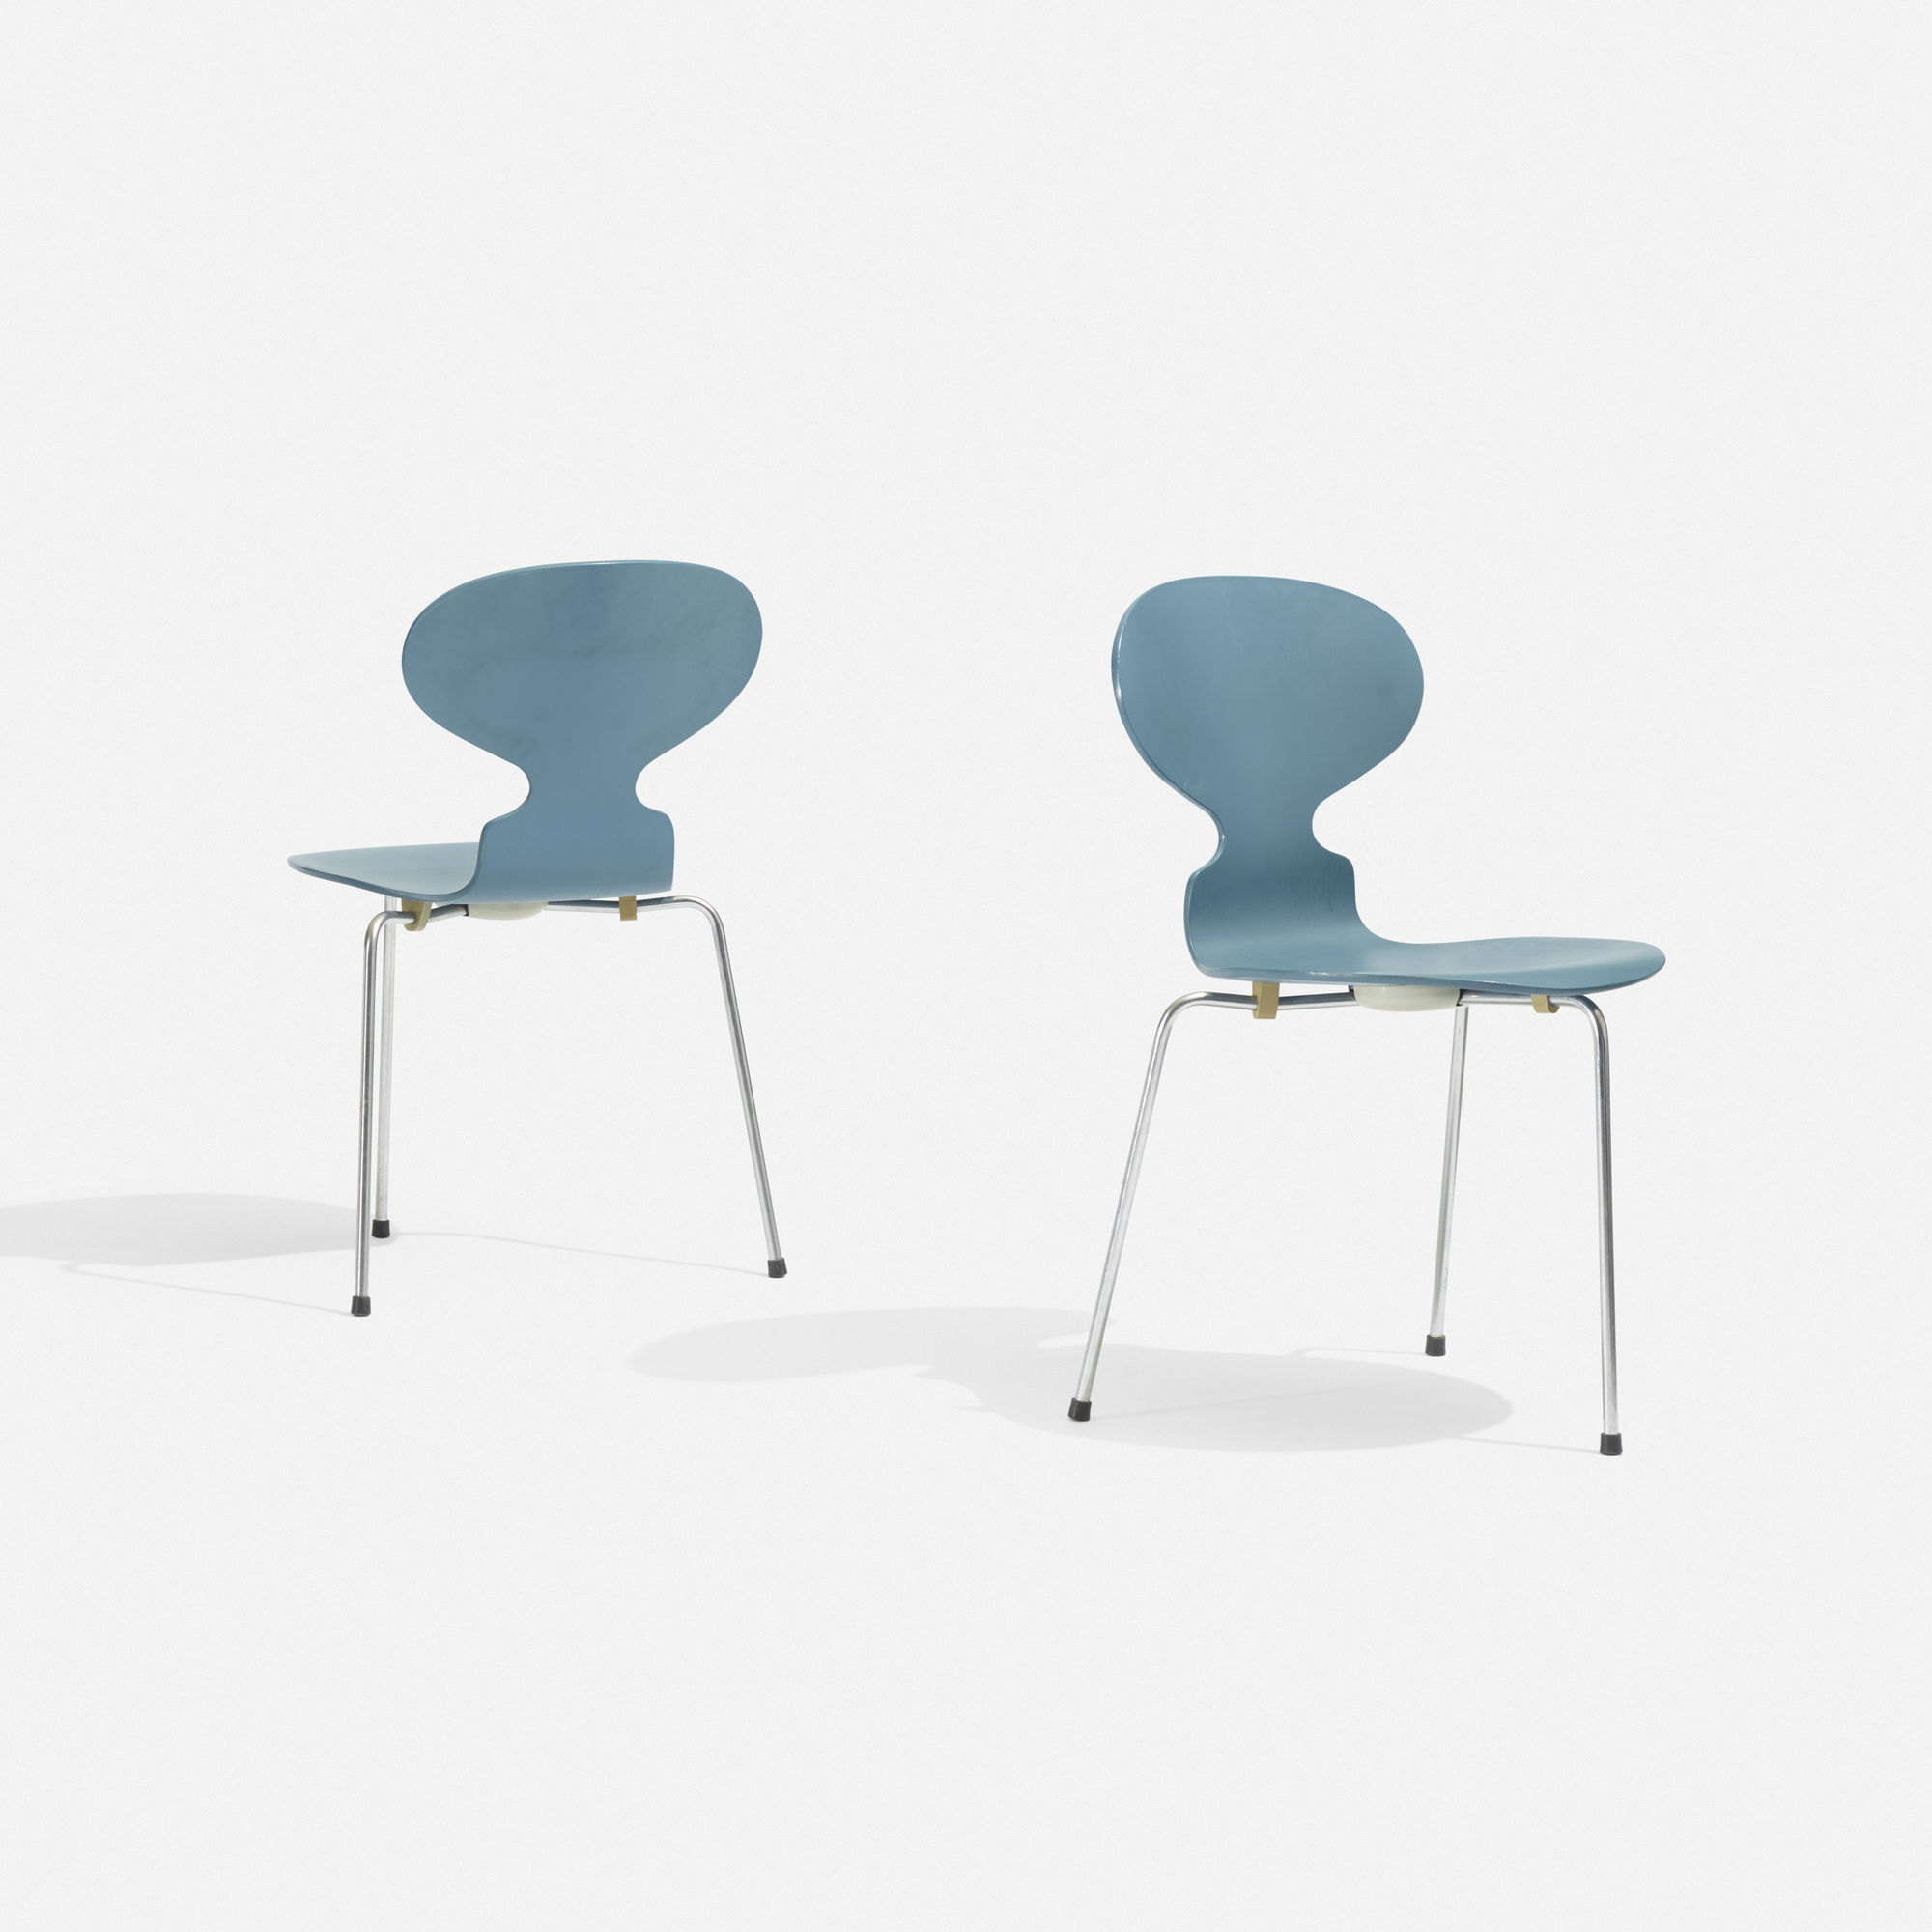 Incroyable 223: Arne Jacobsen / Ant Chair, Pair (1 Of 2)